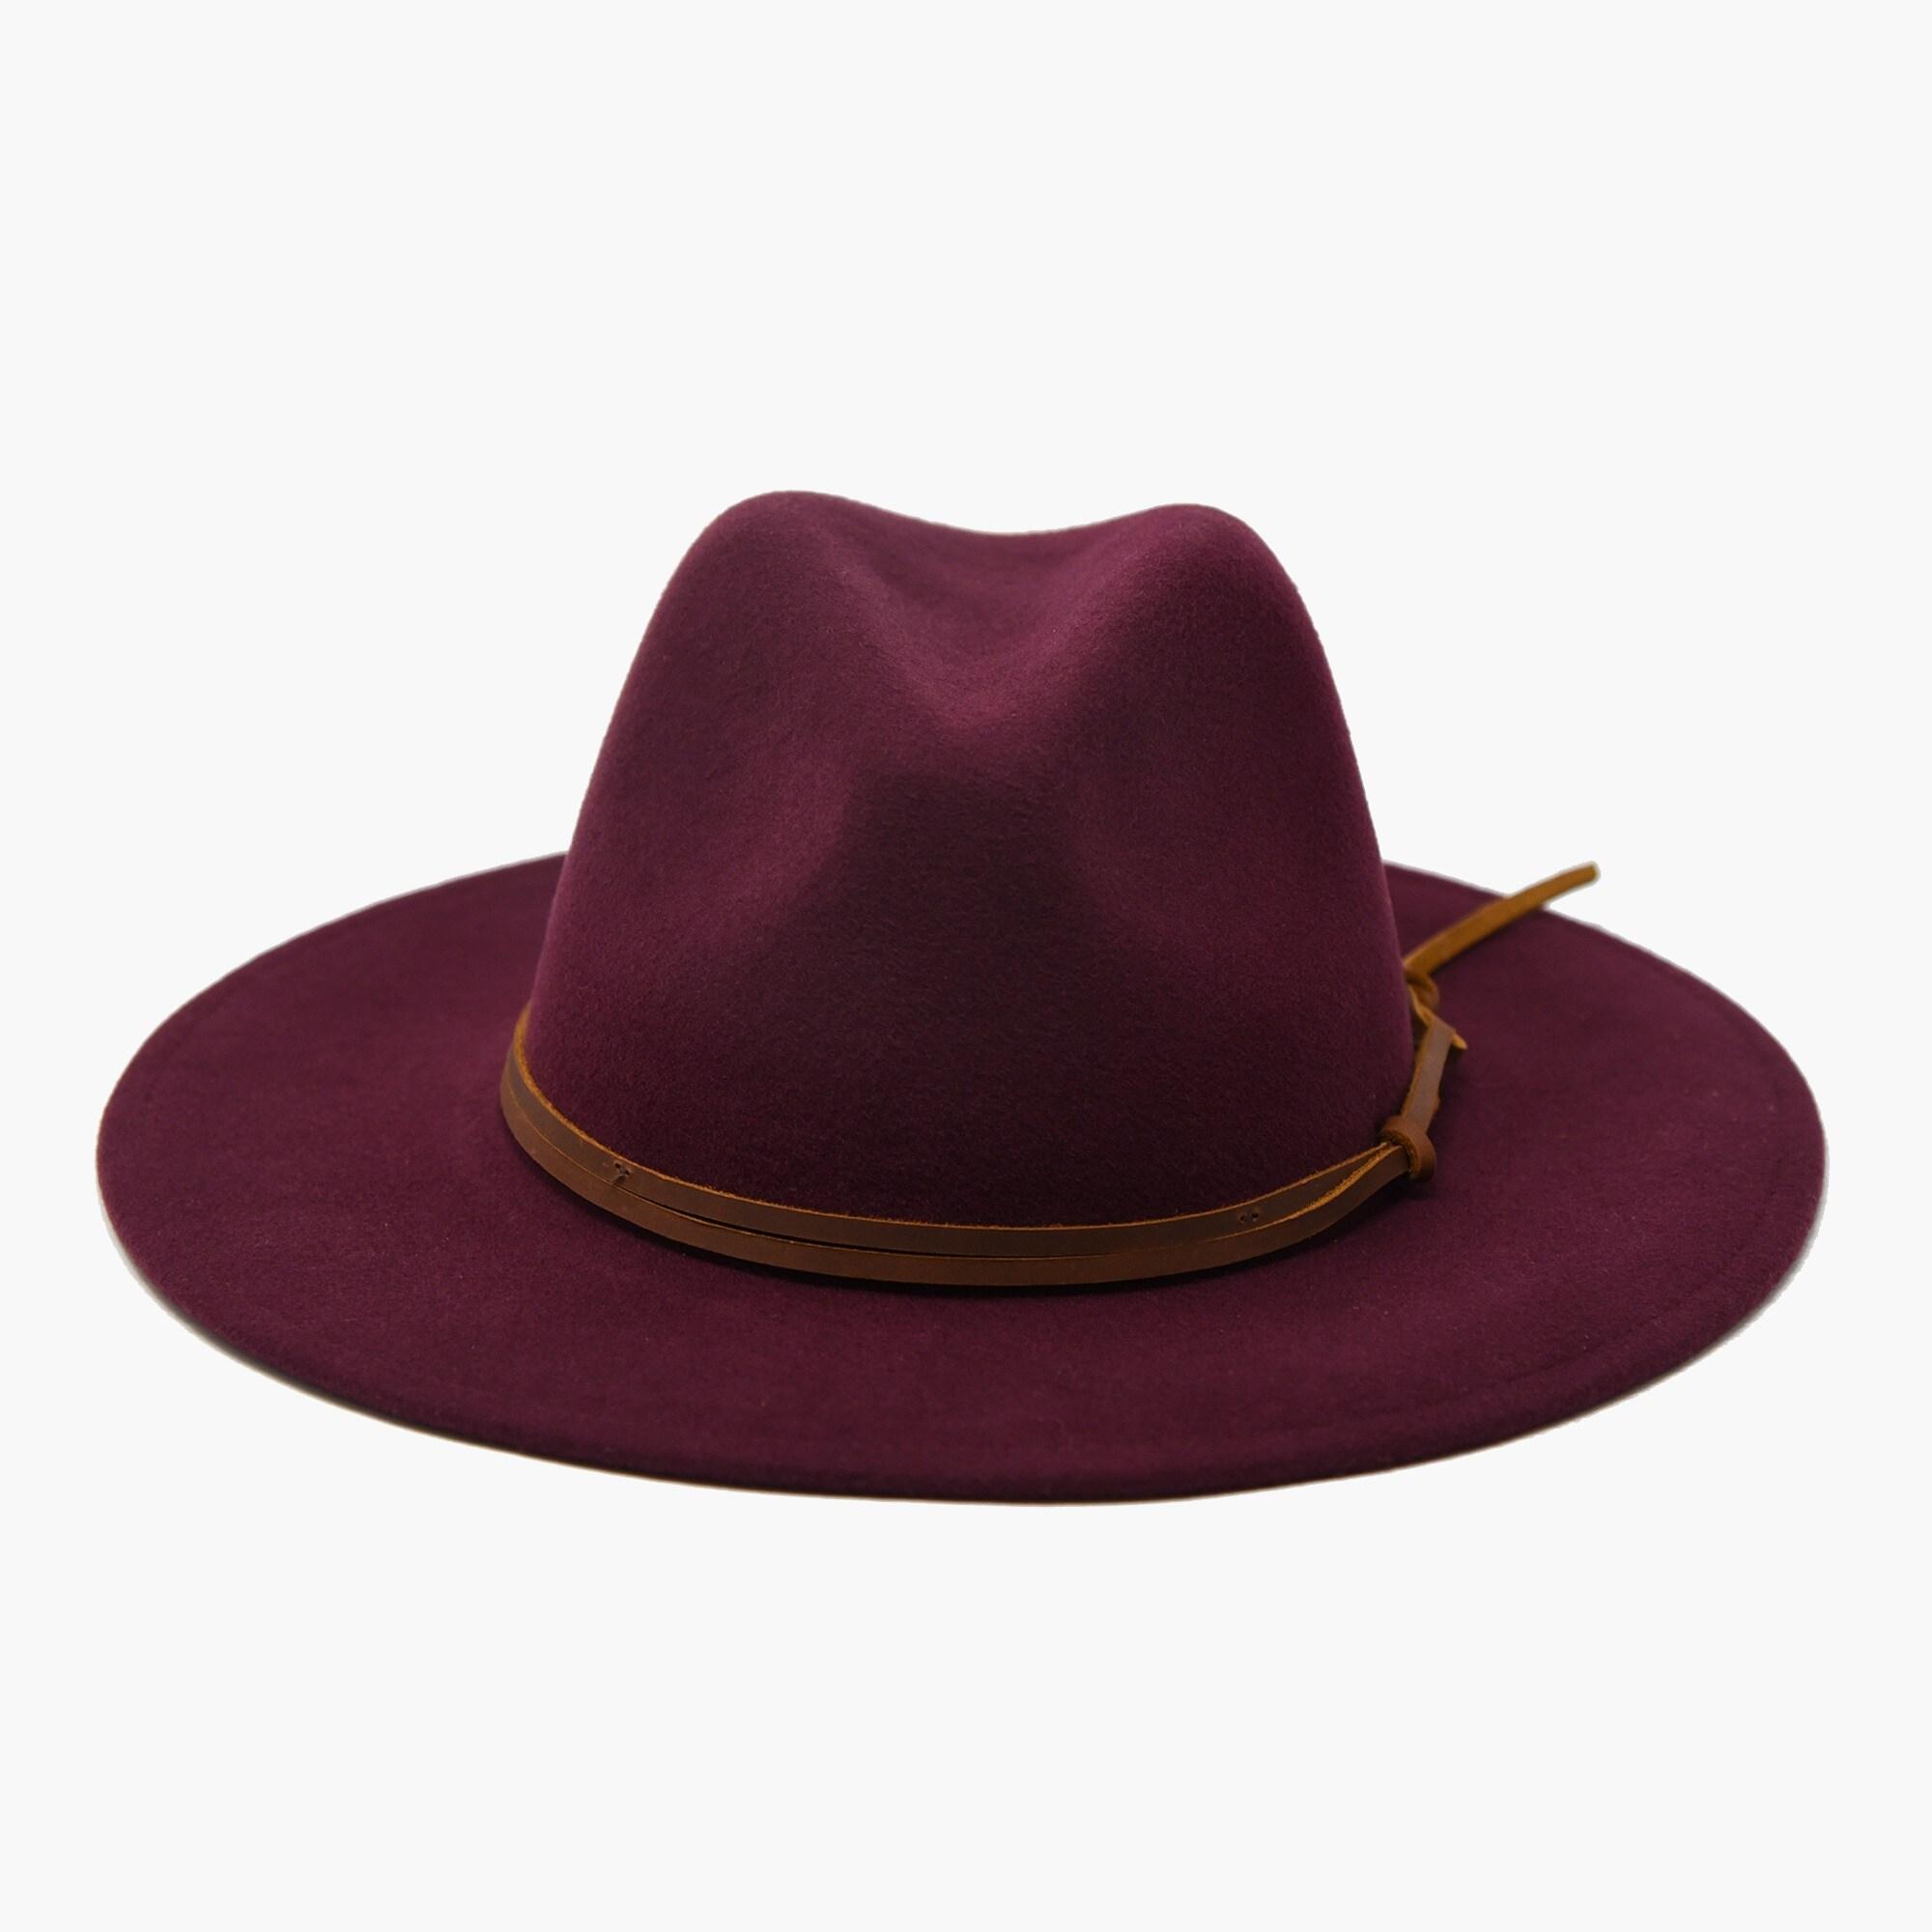 WYETH™ Billie rancher hat